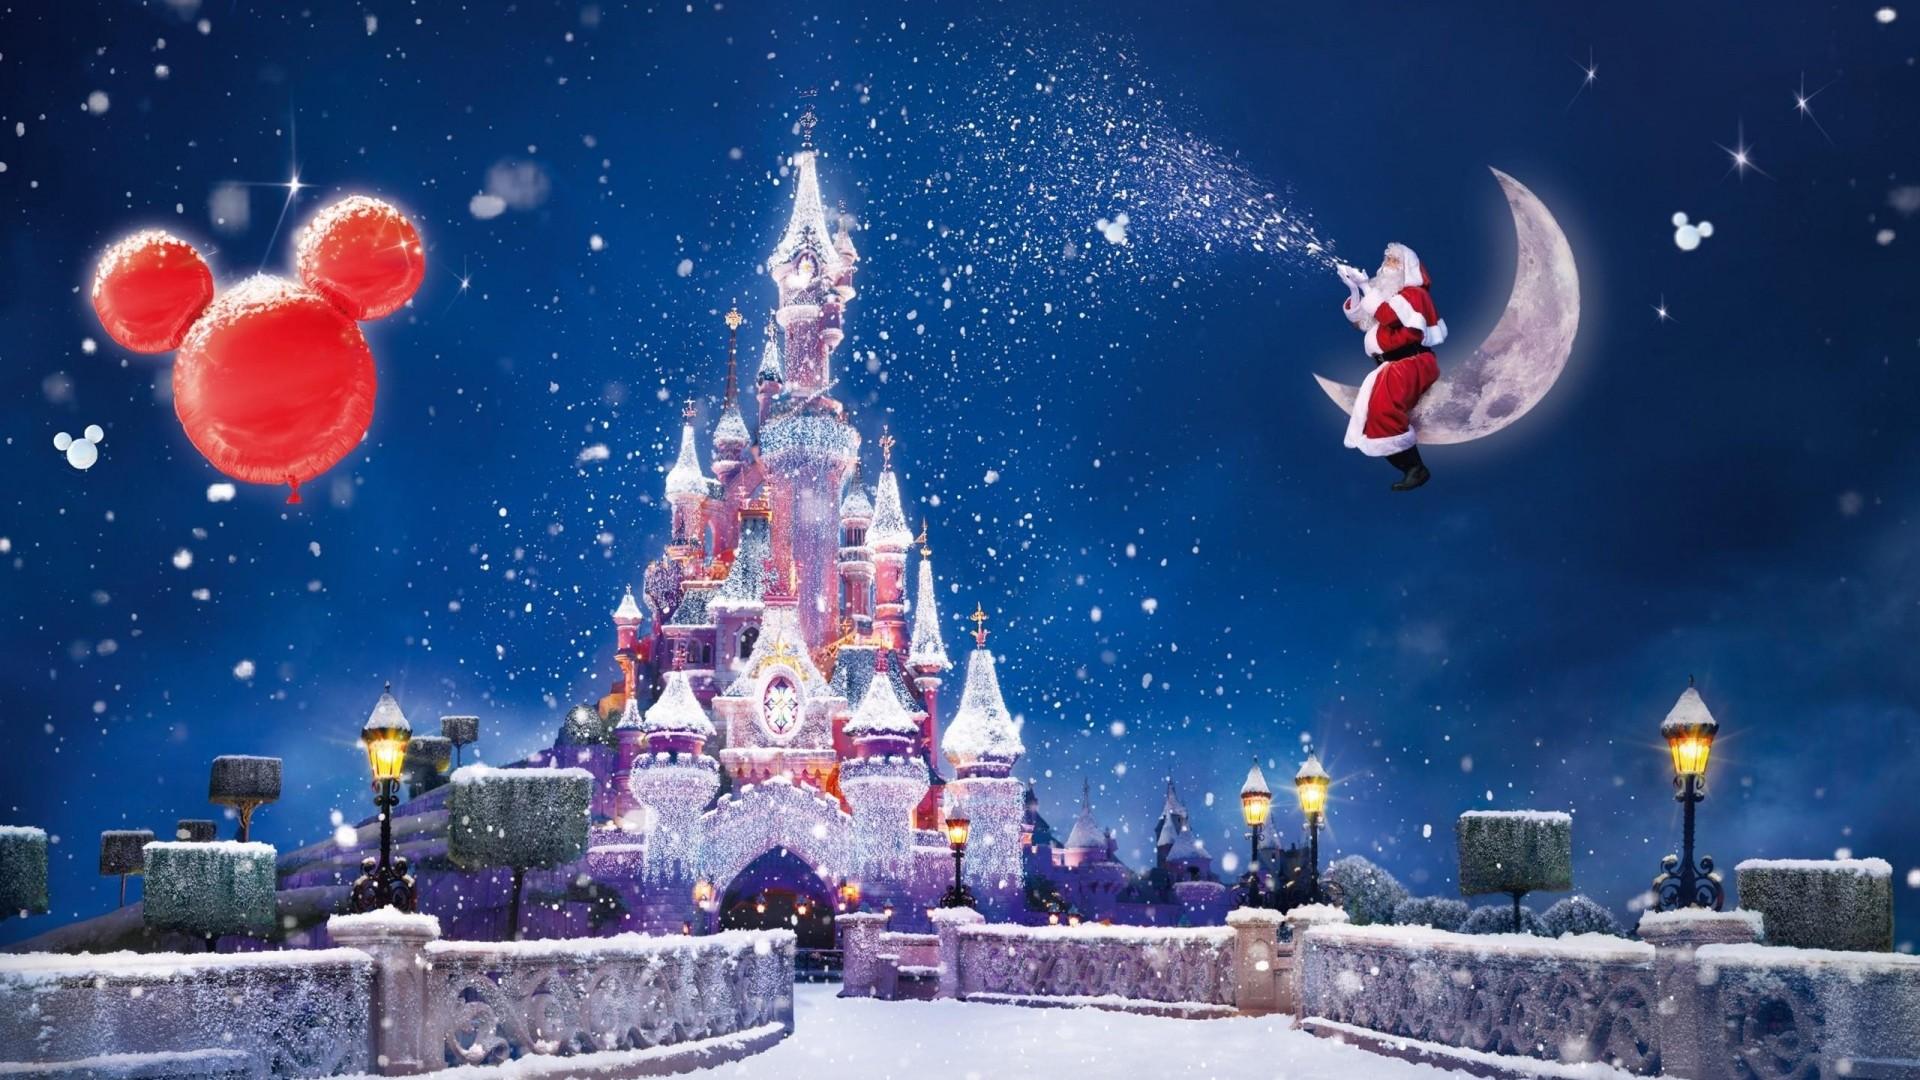 Preview wallpaper santa claus, magic, moon, snow, castle, balloons, holiday